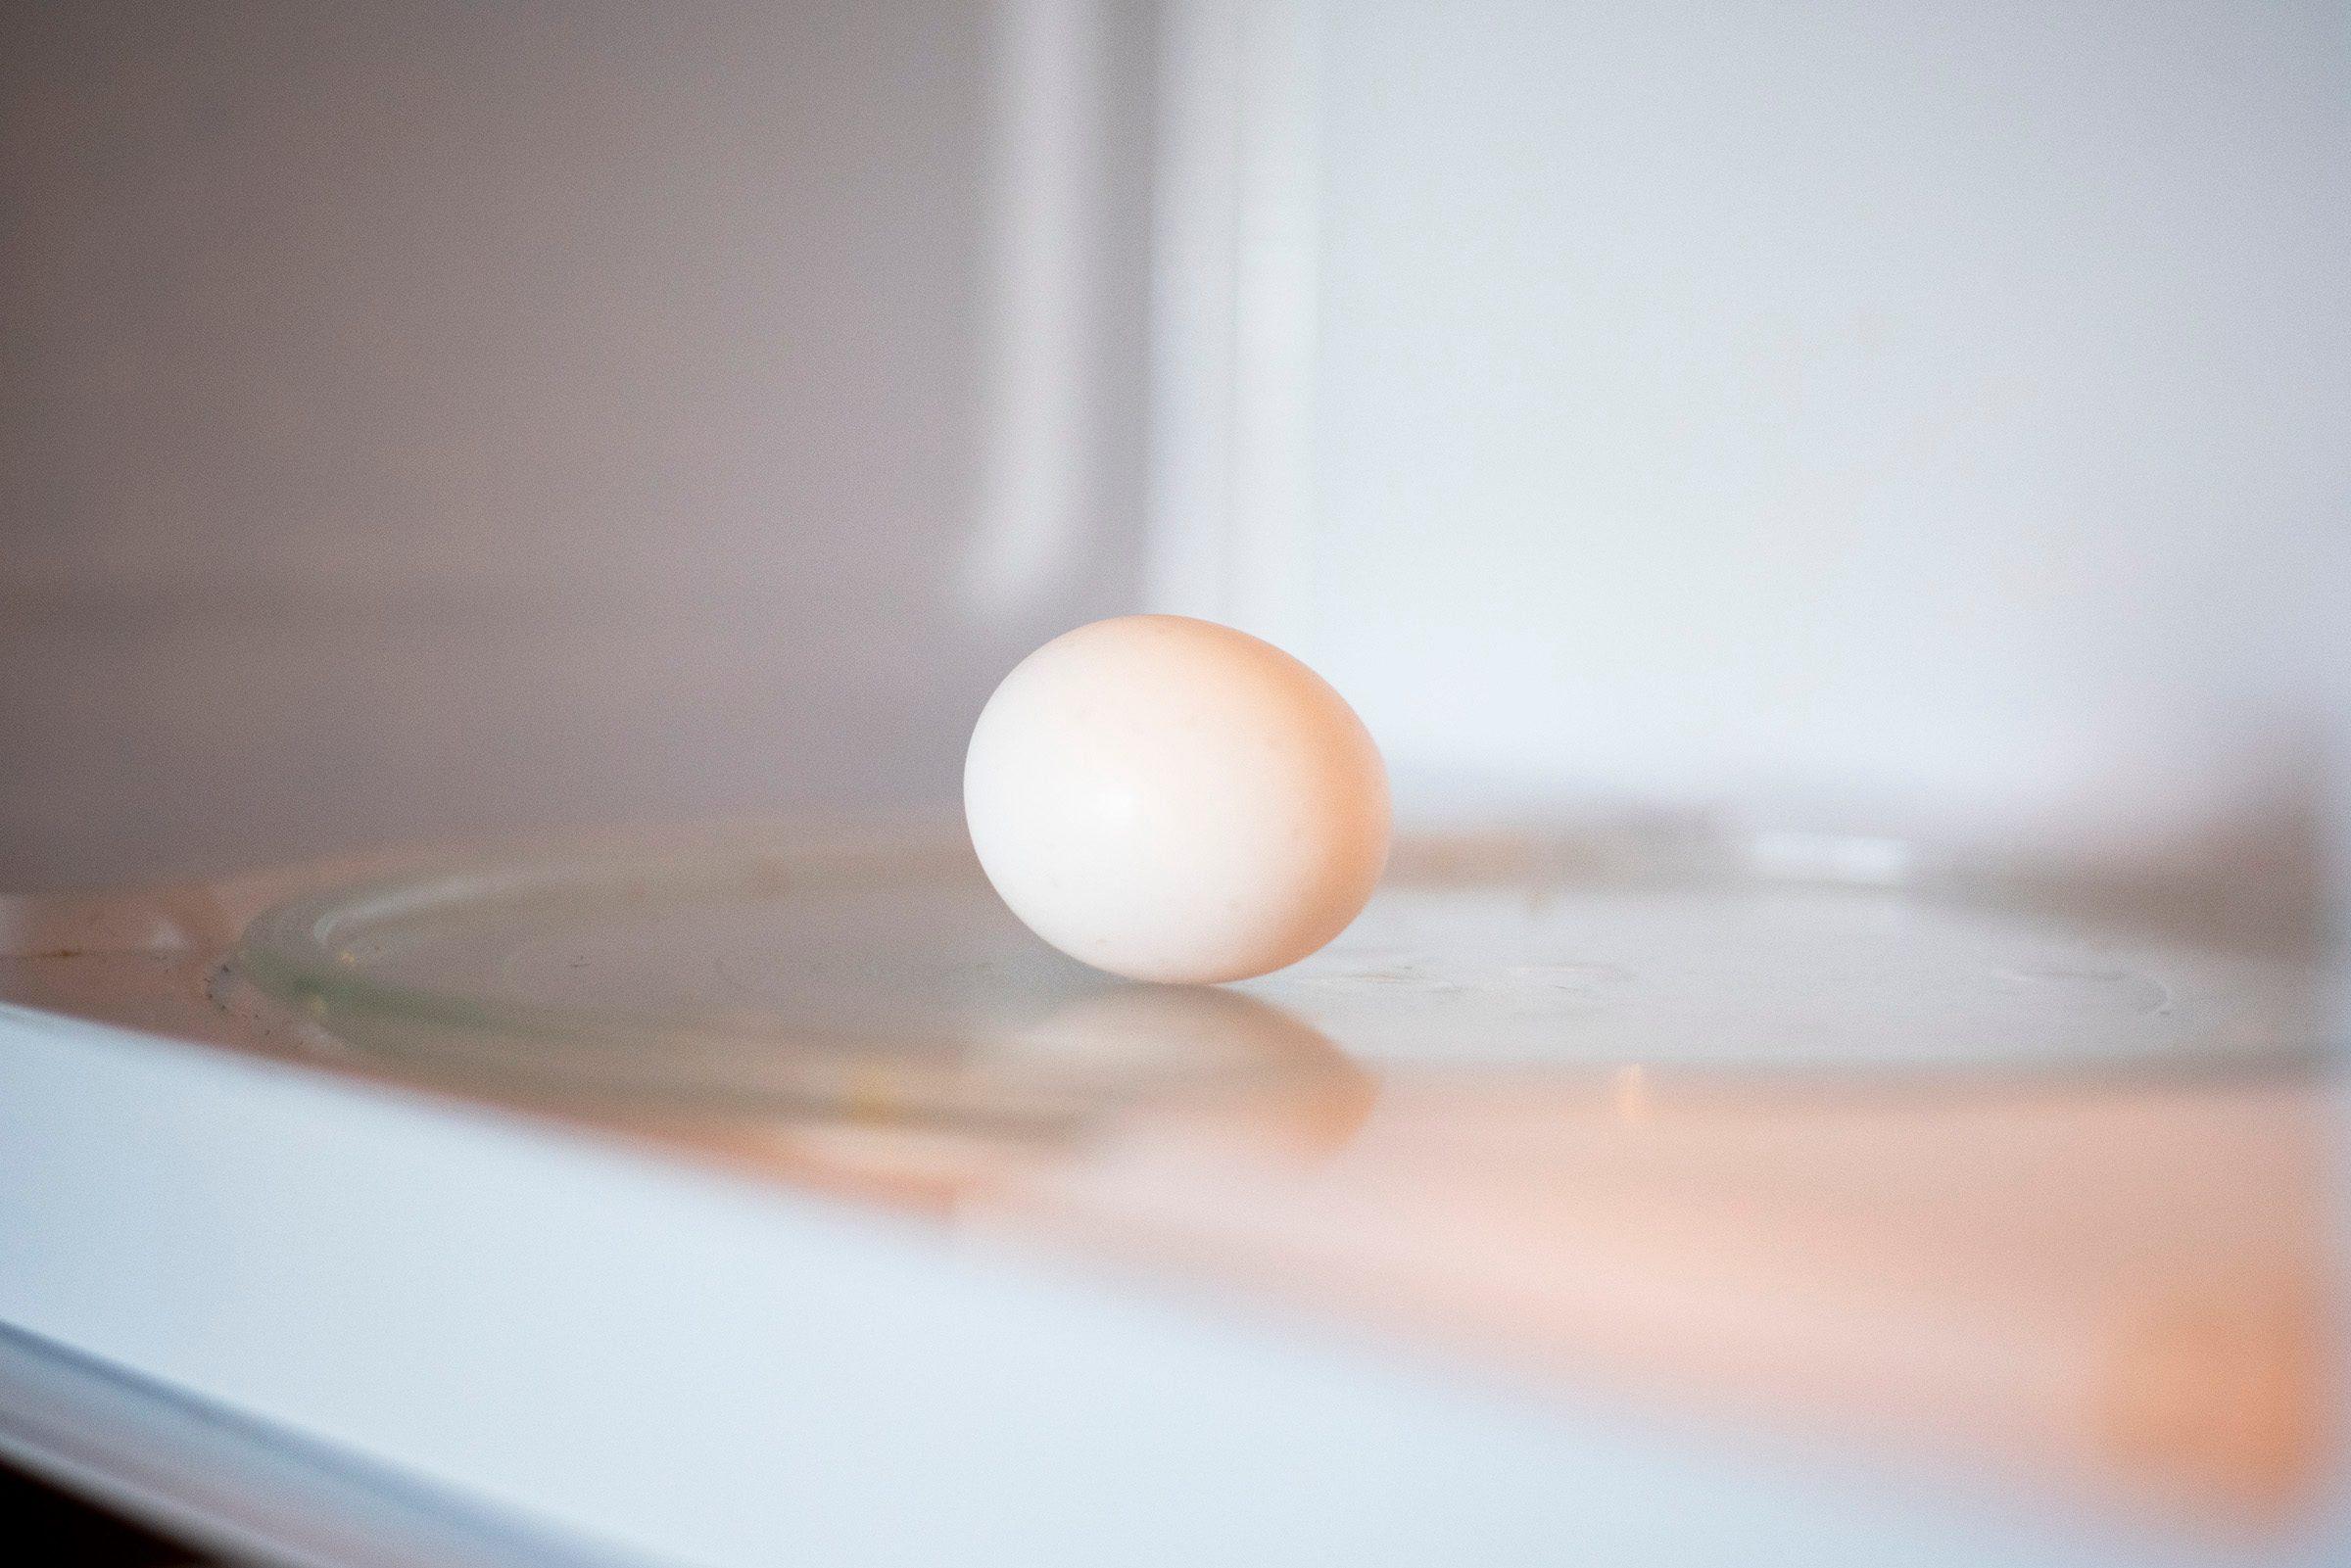 microwave egg